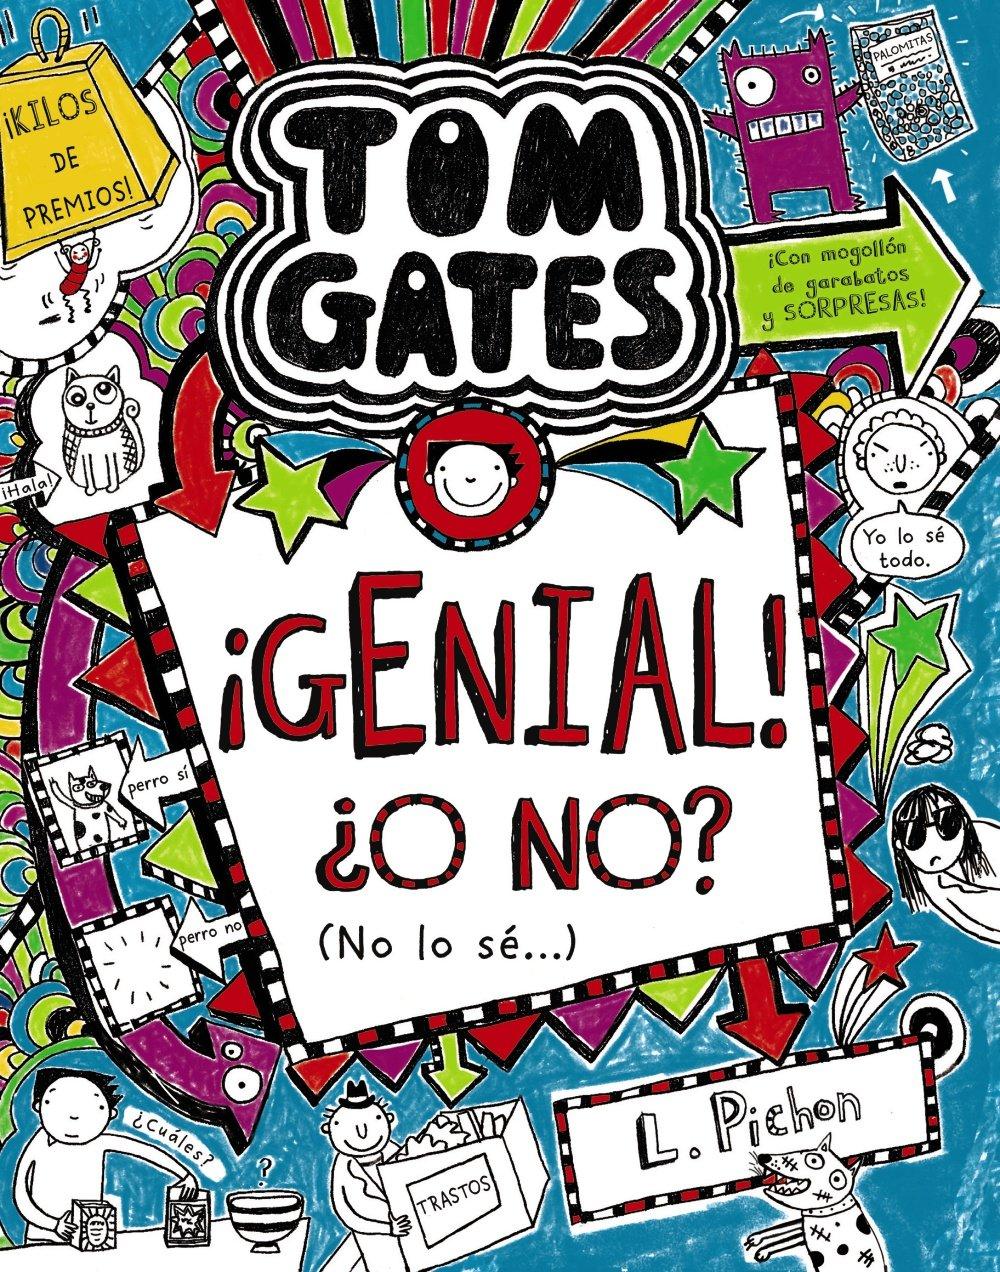 Download Tom Gates Genial o no? (Nol lo sé) (Spanish Edition) PDF